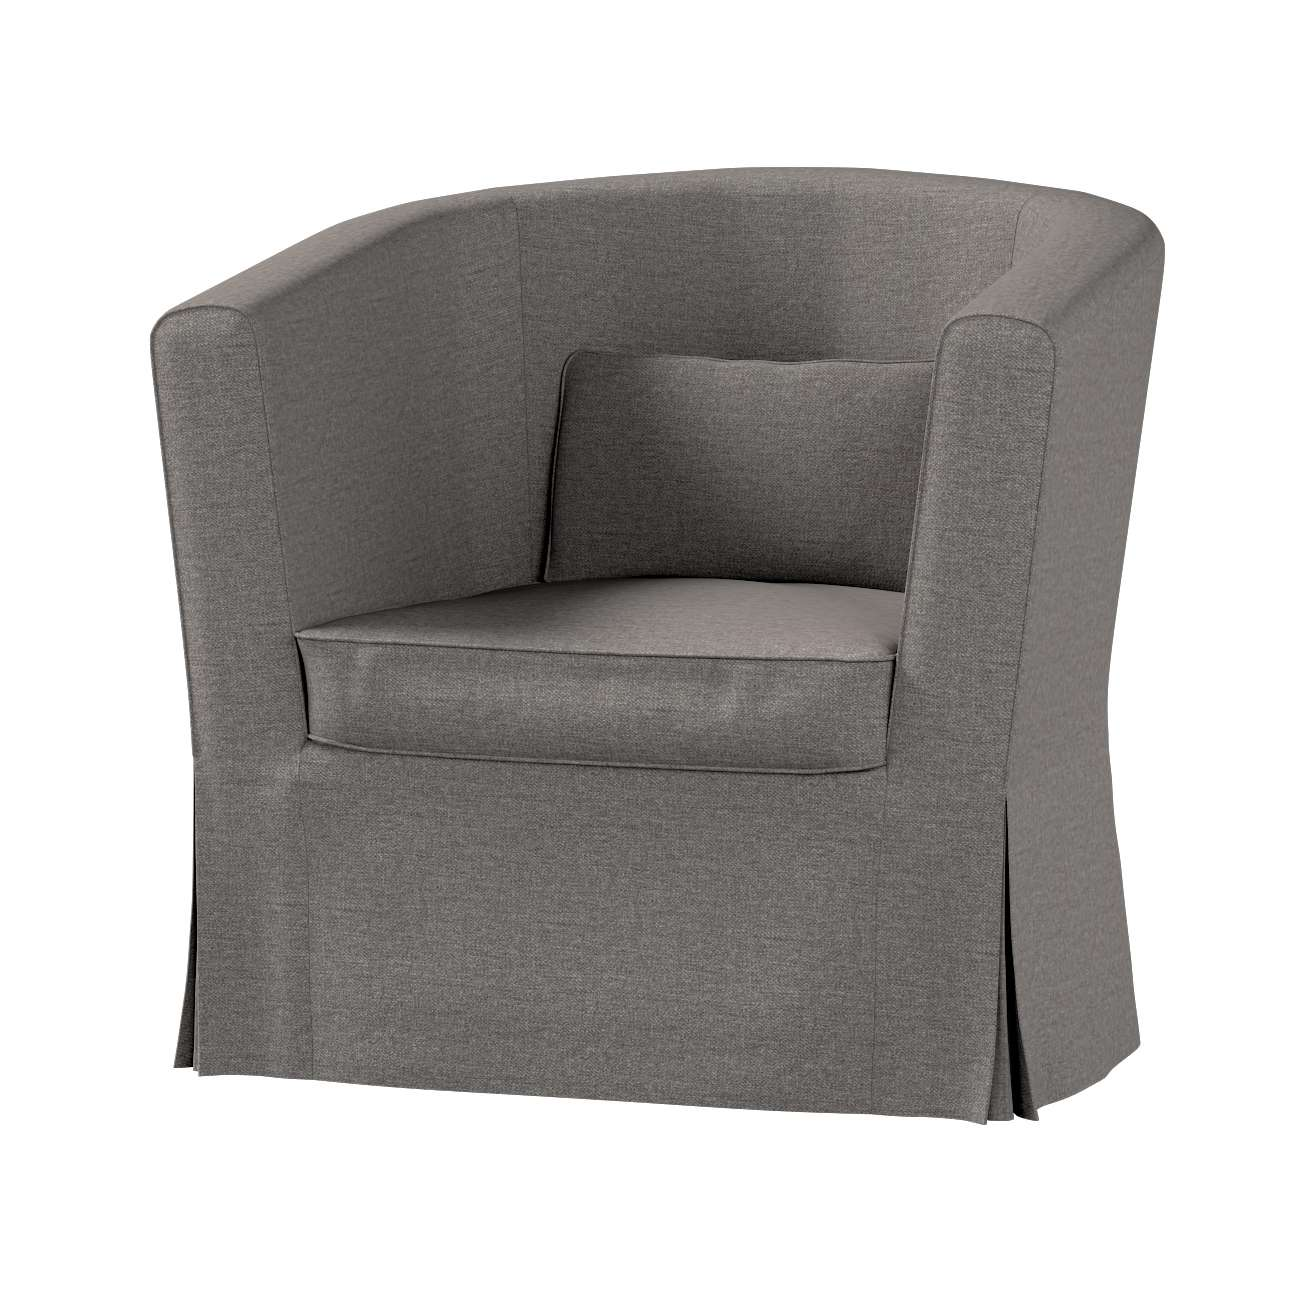 Ektorp Tullsta Sesselbezug Sesselhusse, Ektorp Tullsta von der Kollektion Edinburgh , Stoff: 115-77